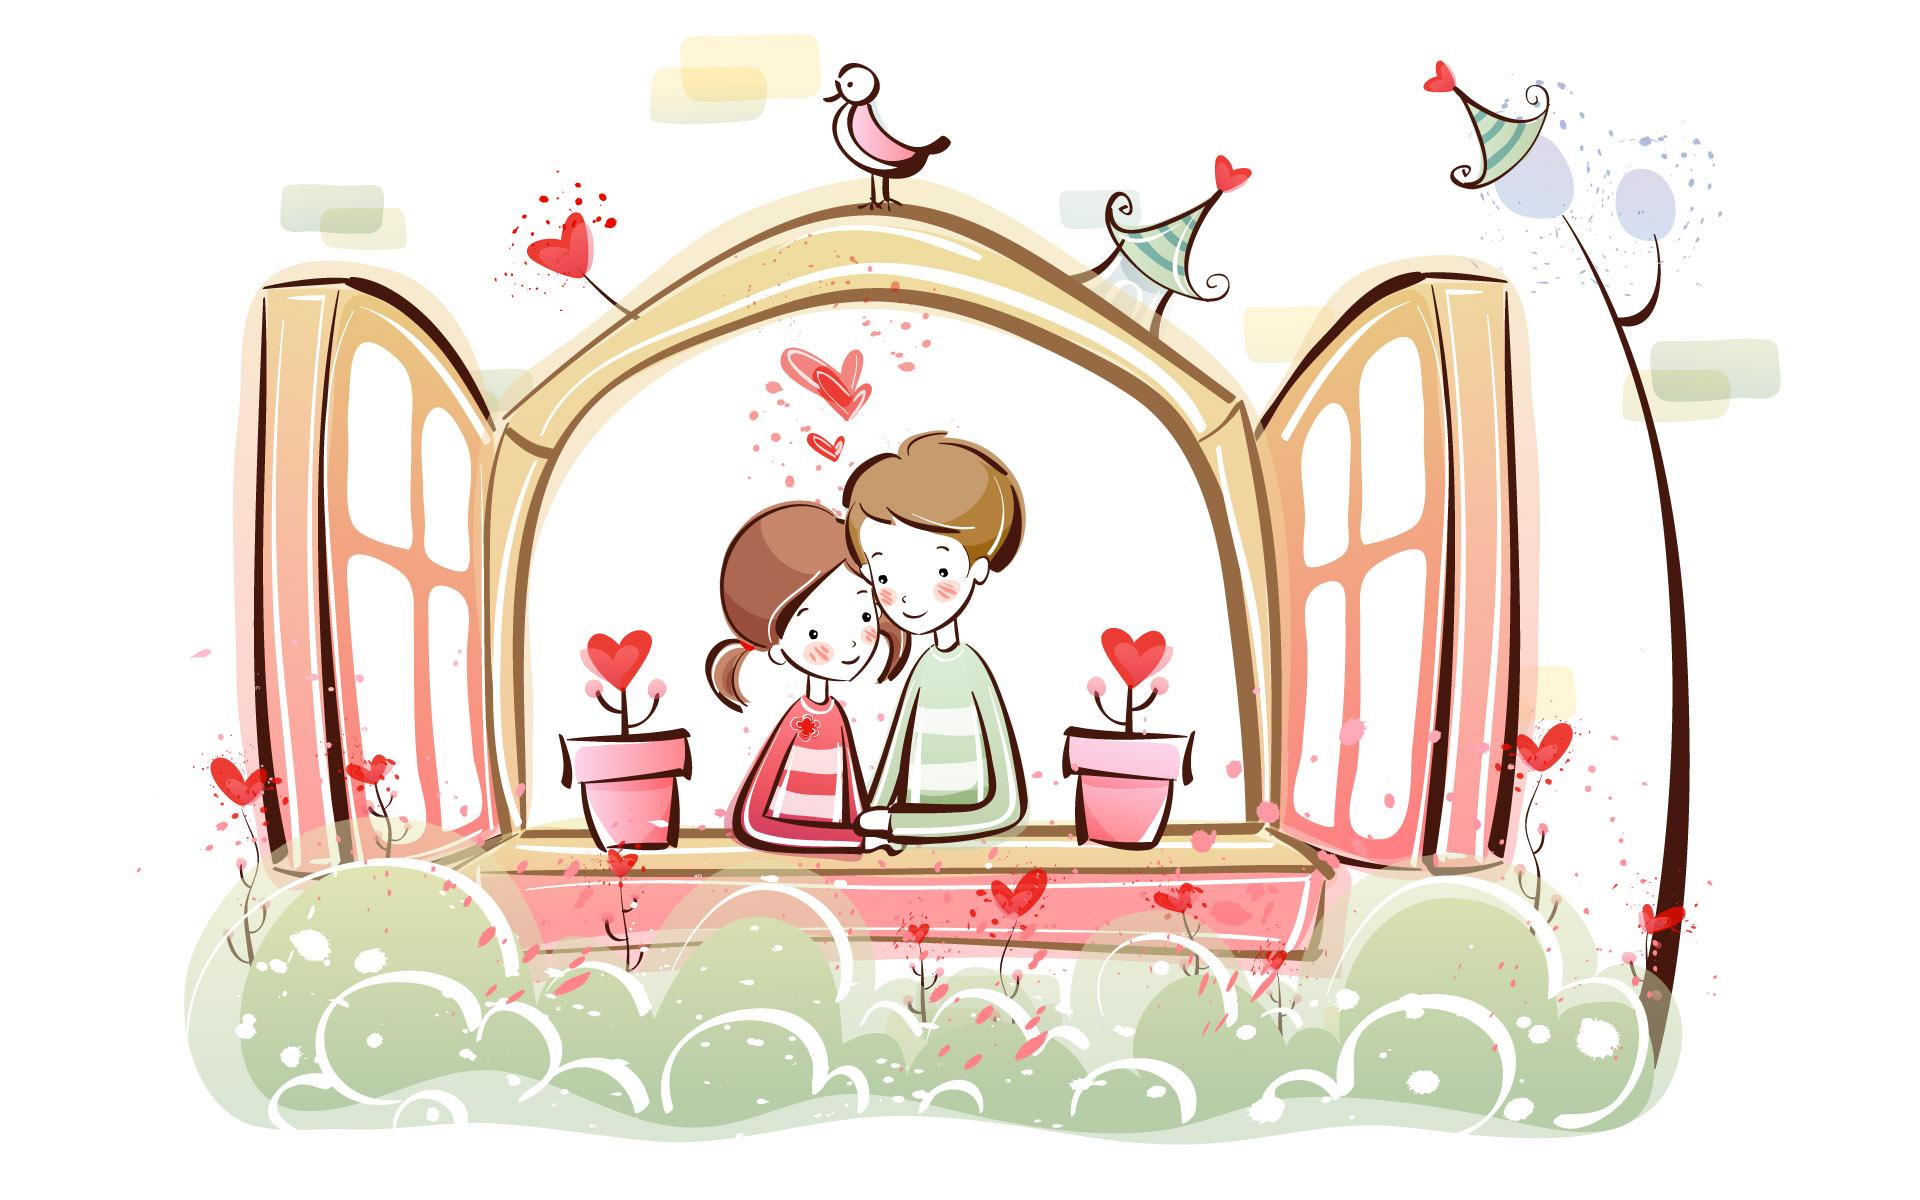 11735-romantic-valentine39s-day-illustration-class.jpg